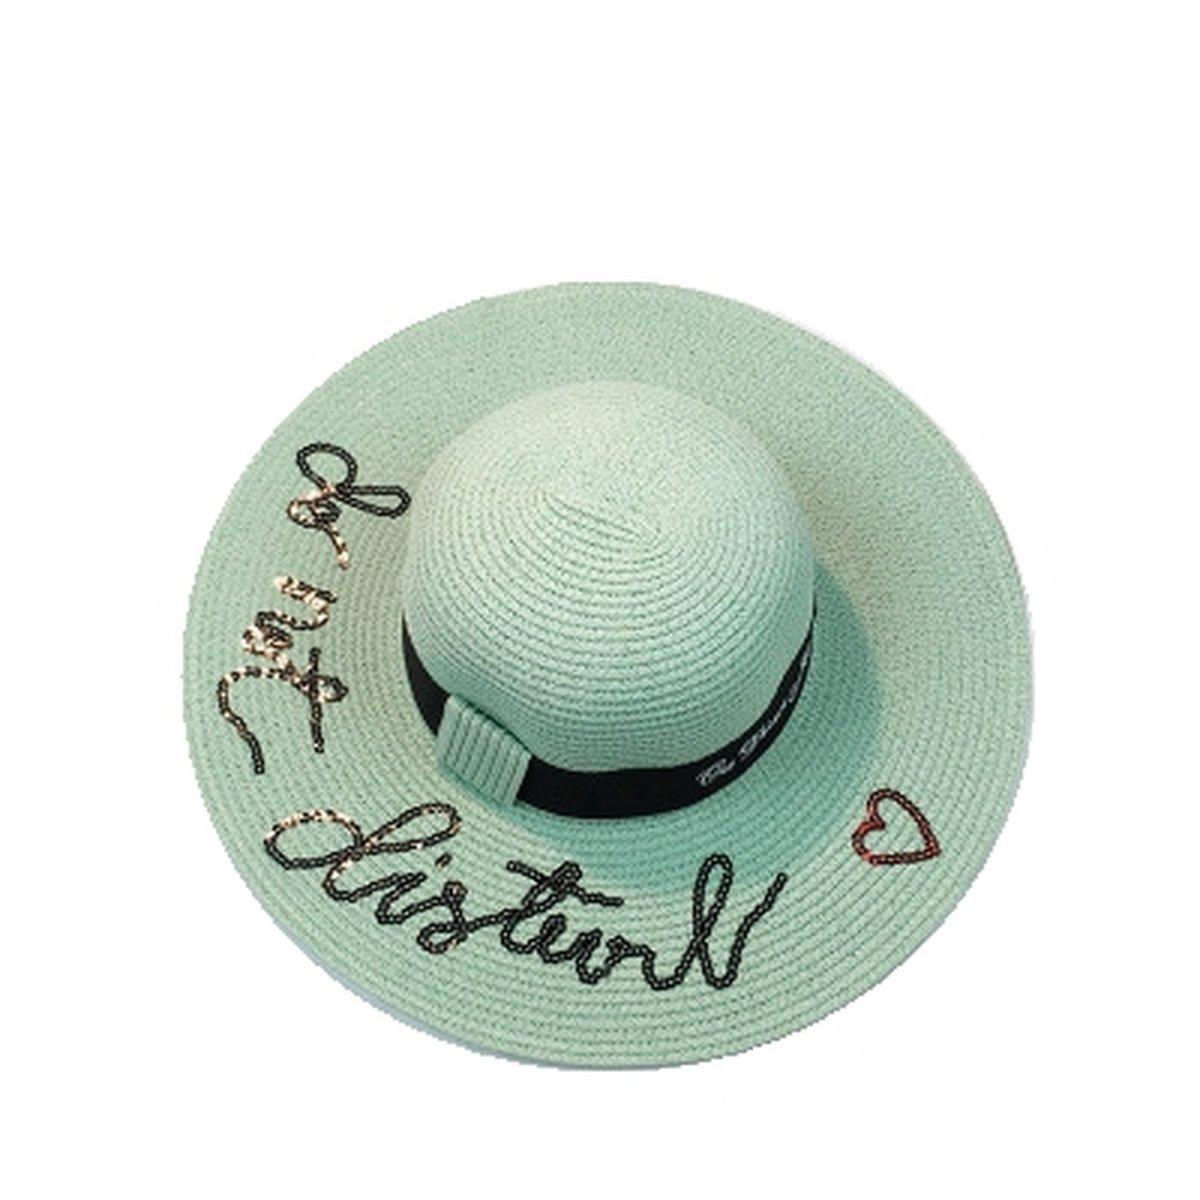 Love Letters Floppy Straw Sun Hat Women Big Brim Beach Tropical Vacation Hat